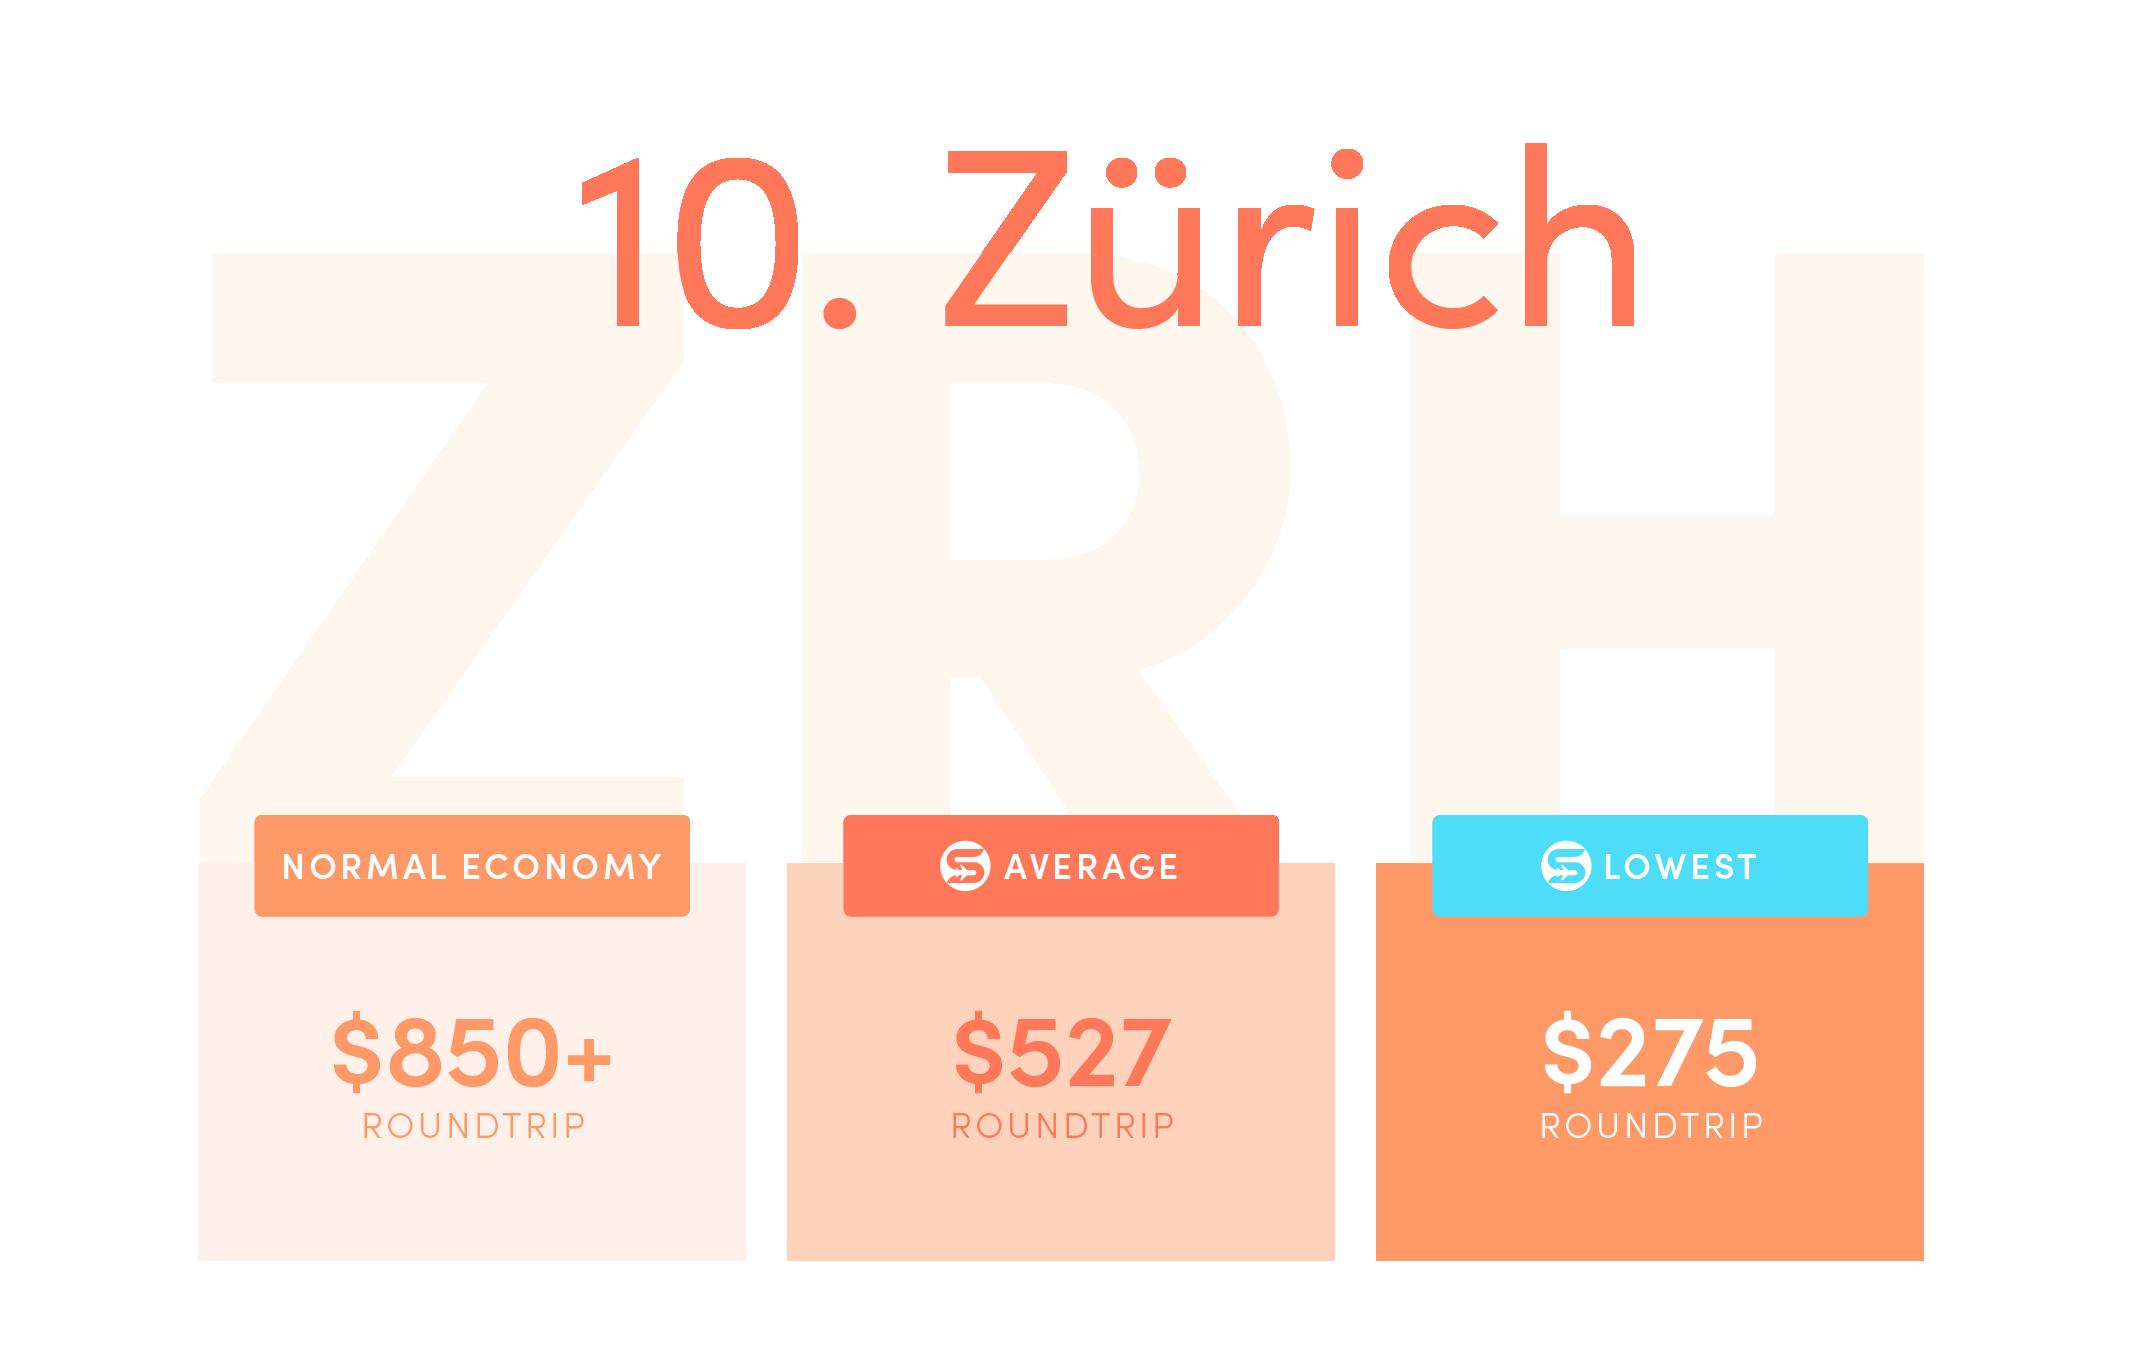 Zürich (ZRH). Normal economy price from the US: $850+ roundtrip. Average Scott's Cheap Flights economy price: $527 roundtrip. Lowest Scott's Cheap Flights price in 2021: $275 roundtrip.